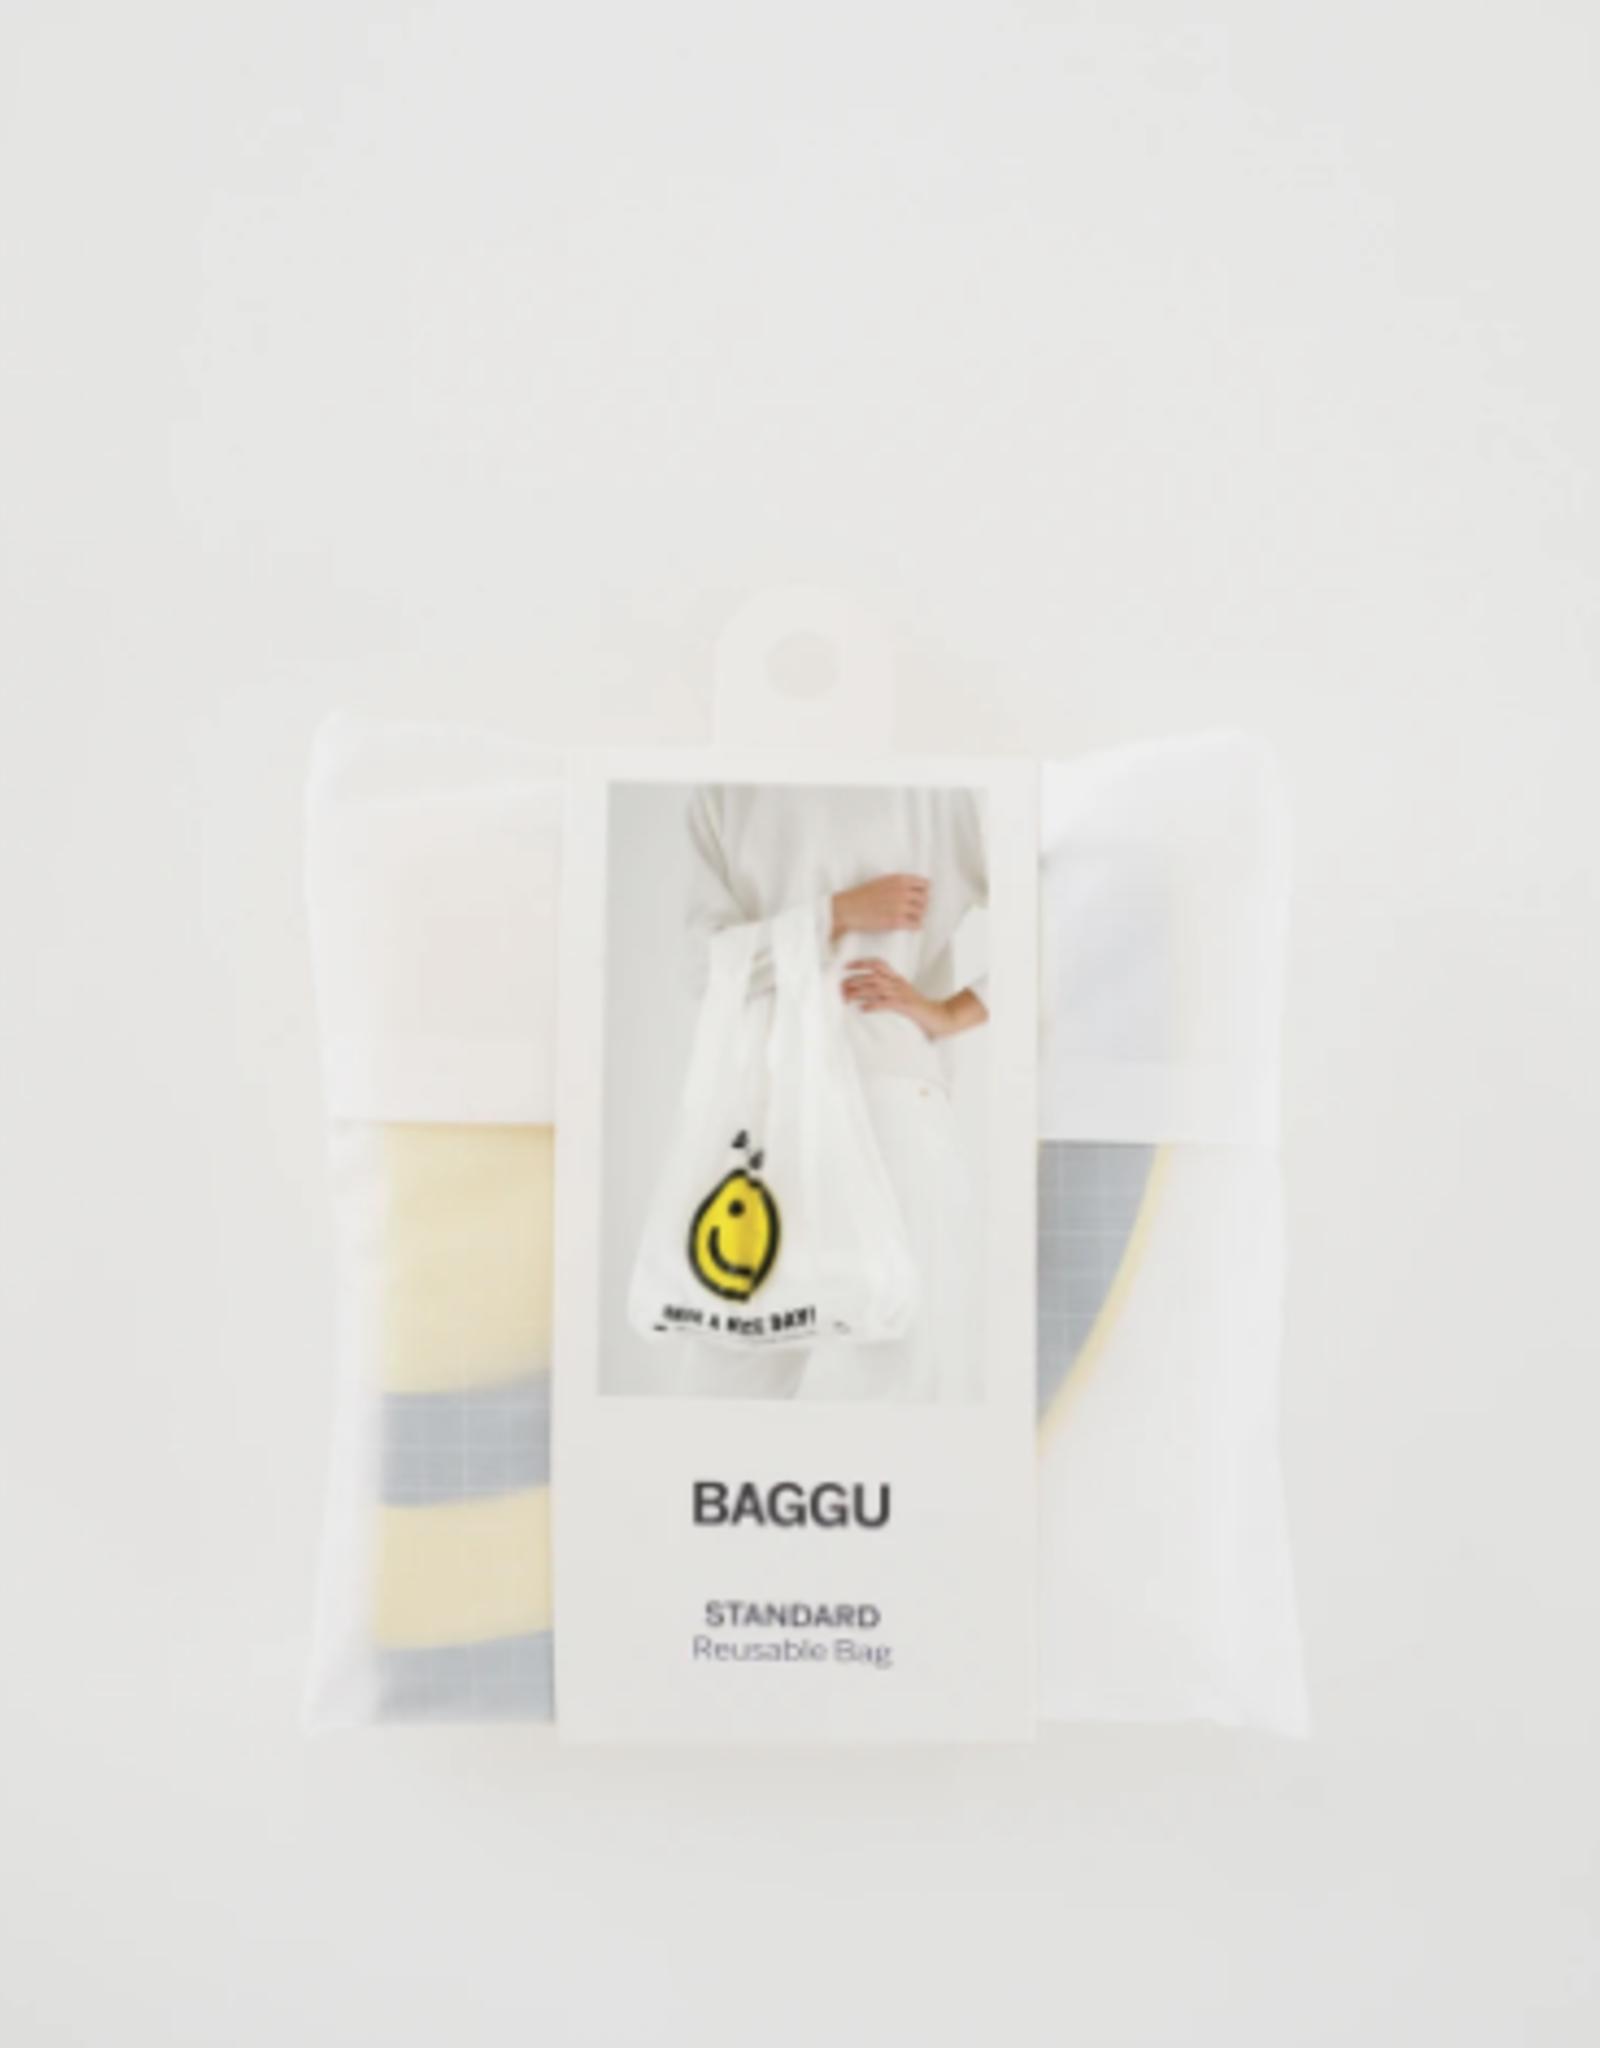 Standard Baggu - Thank You Happy